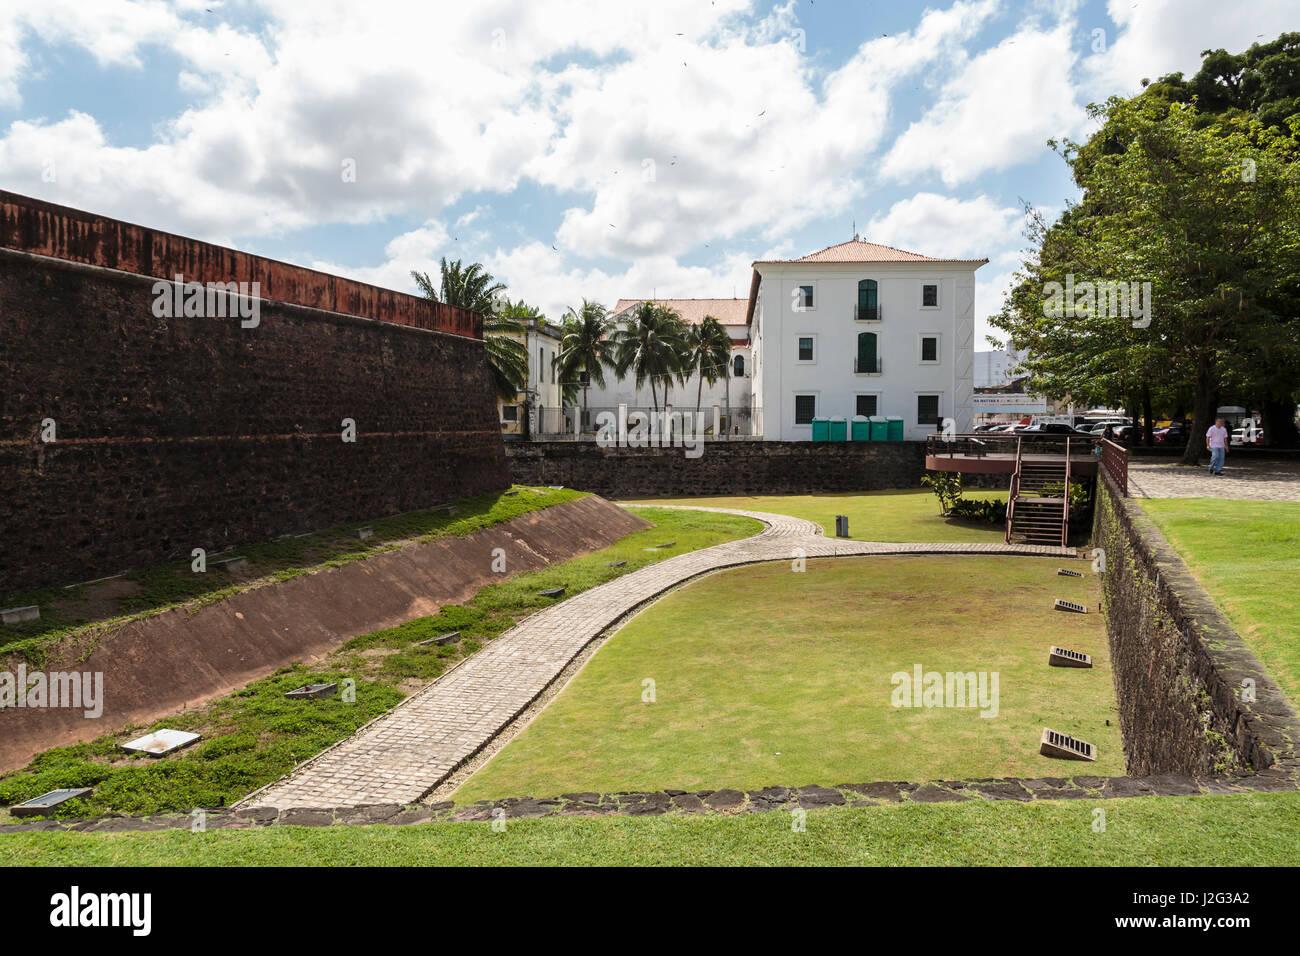 South America, Brazil, Belem. Moat of Presepio Fort. - Stock Image